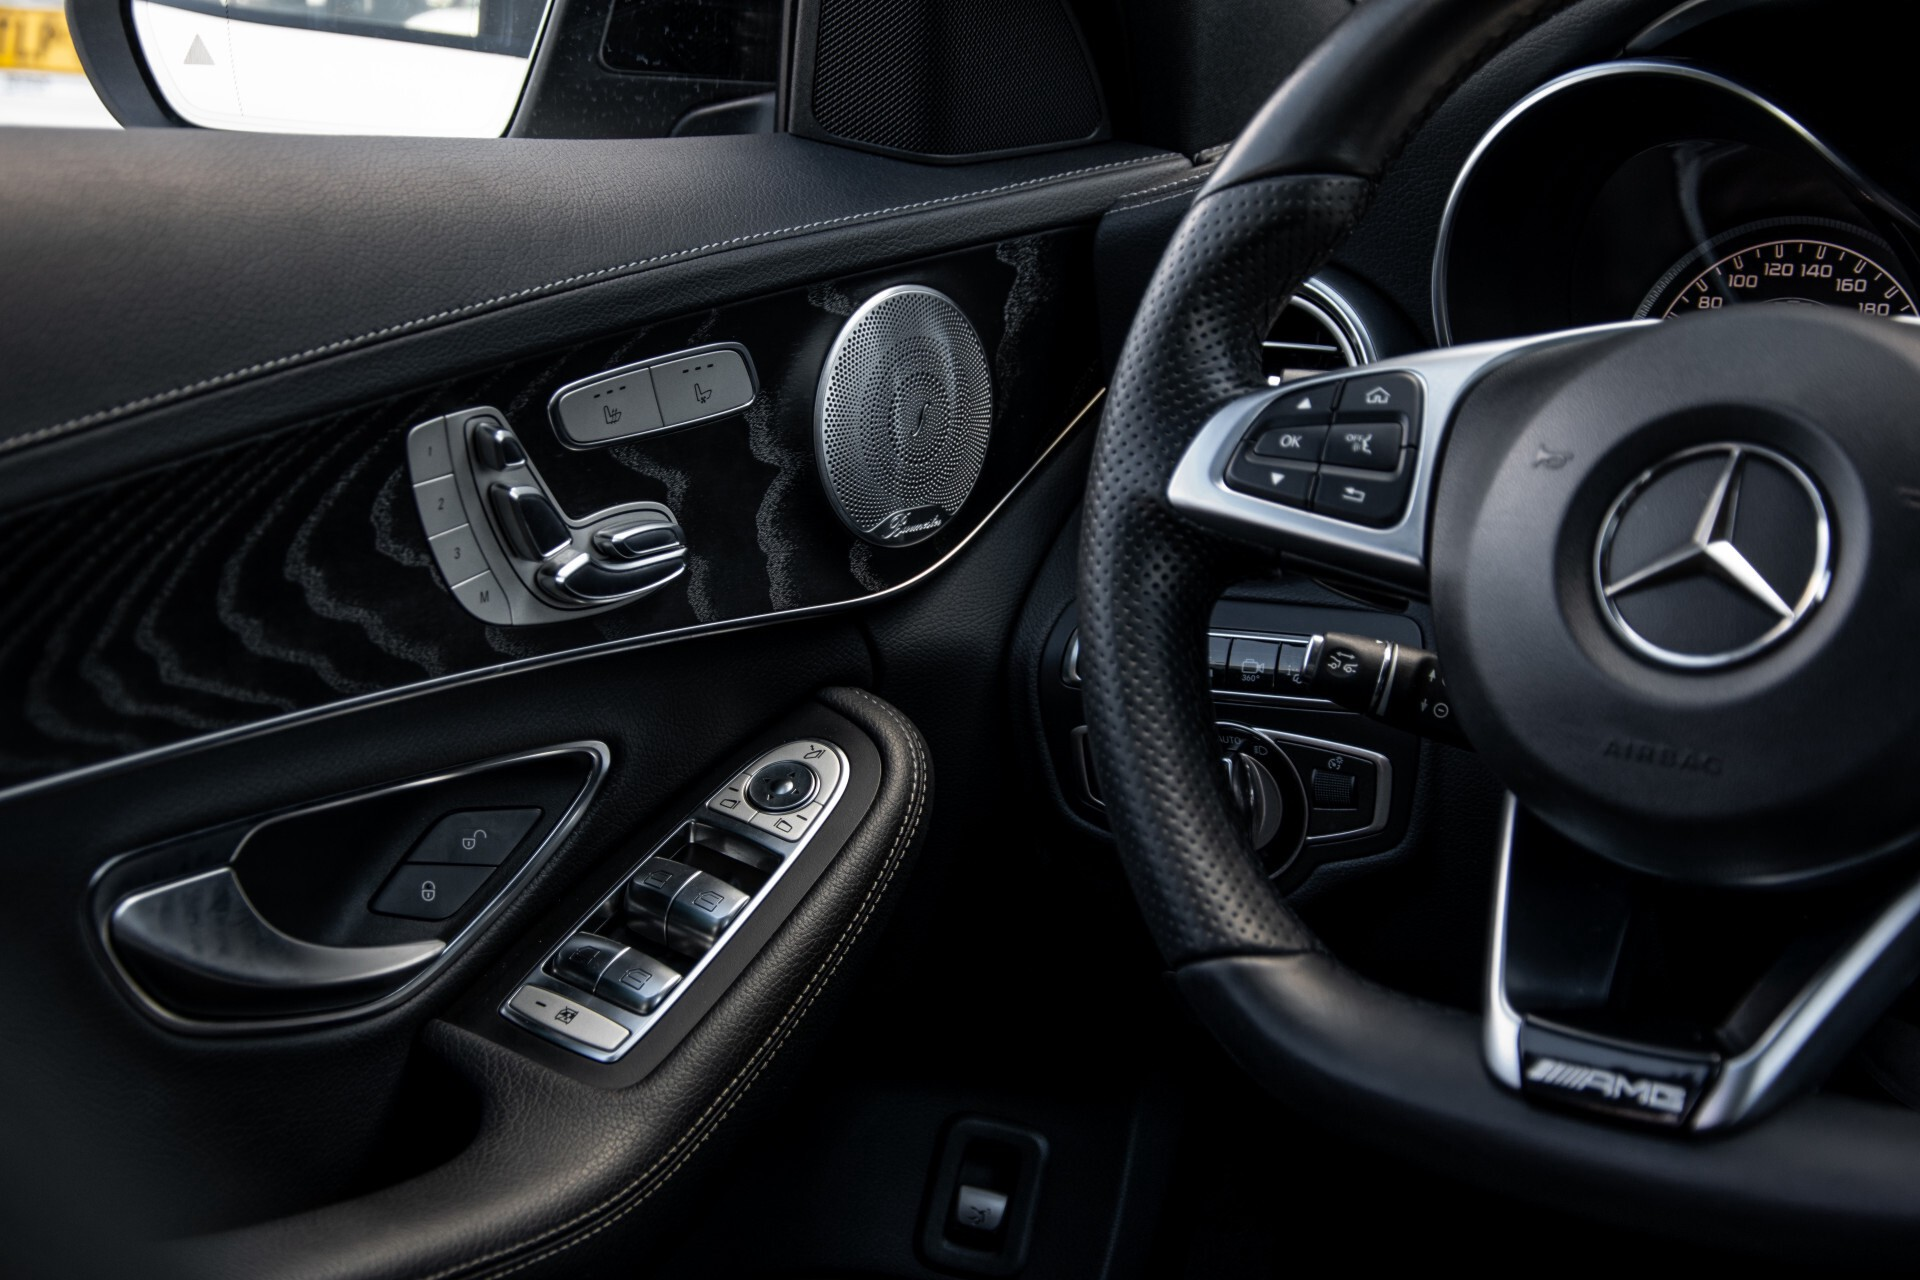 Mercedes-Benz C-Klasse 450/43 AMG 4-M Distronic/Standkachel/Panorama/Keyless/Harman-Kardon/Stoelkoeling Aut7 Foto 51